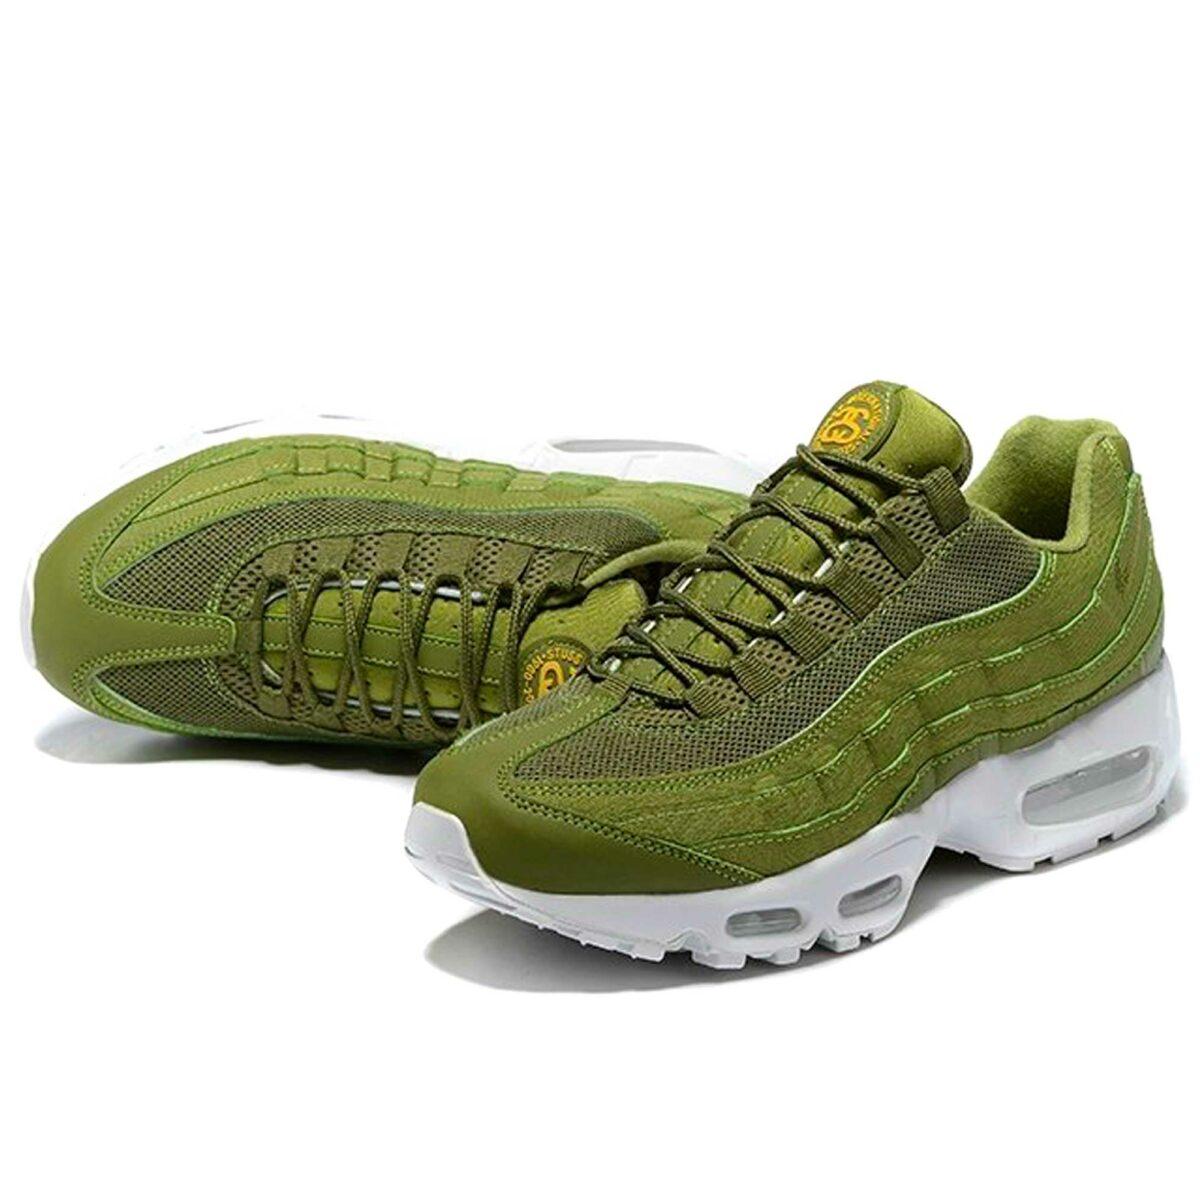 nike air max 95 green купить